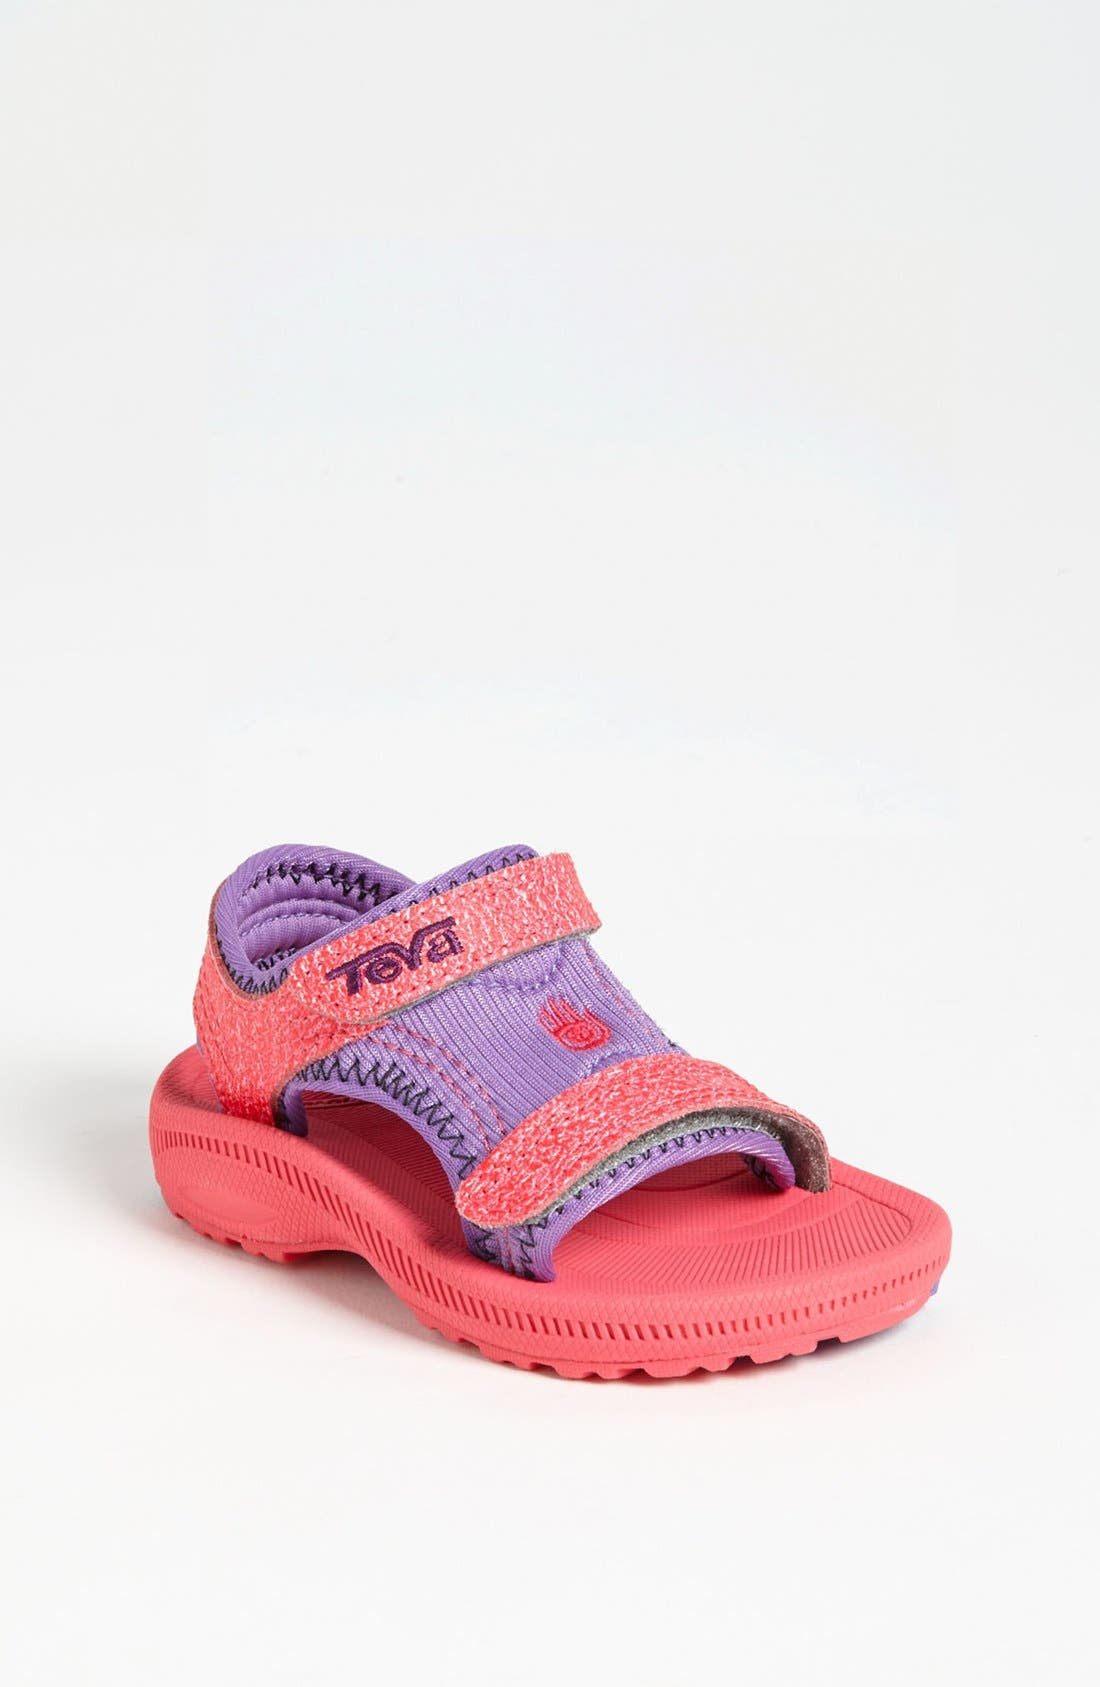 Alternate Image 1 Selected - Teva 'Psyclone 3' Sandal (Baby, Walker, Toddler & Little Kid)